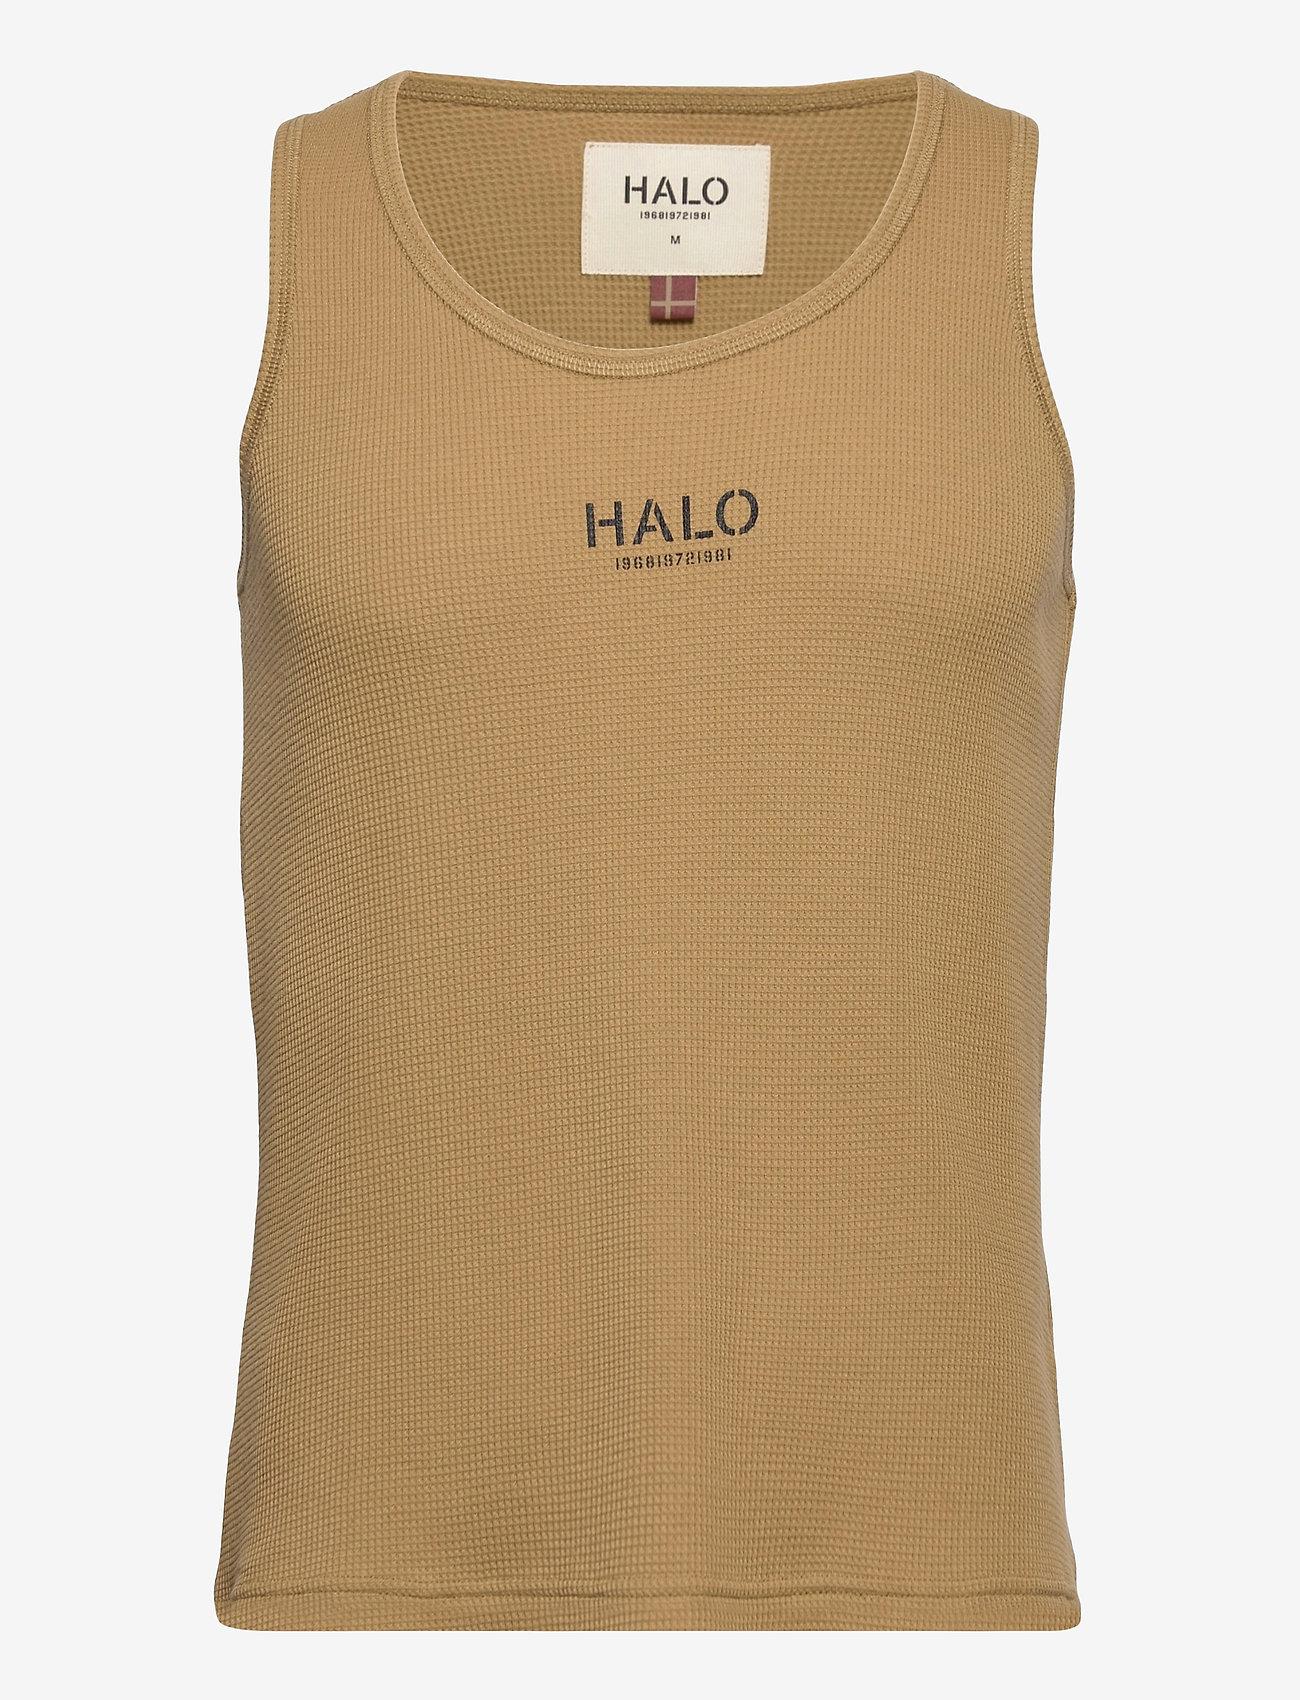 HALO - HALO WOMENS WAFFLE TANK - Ärmellose tops - kelp - 0